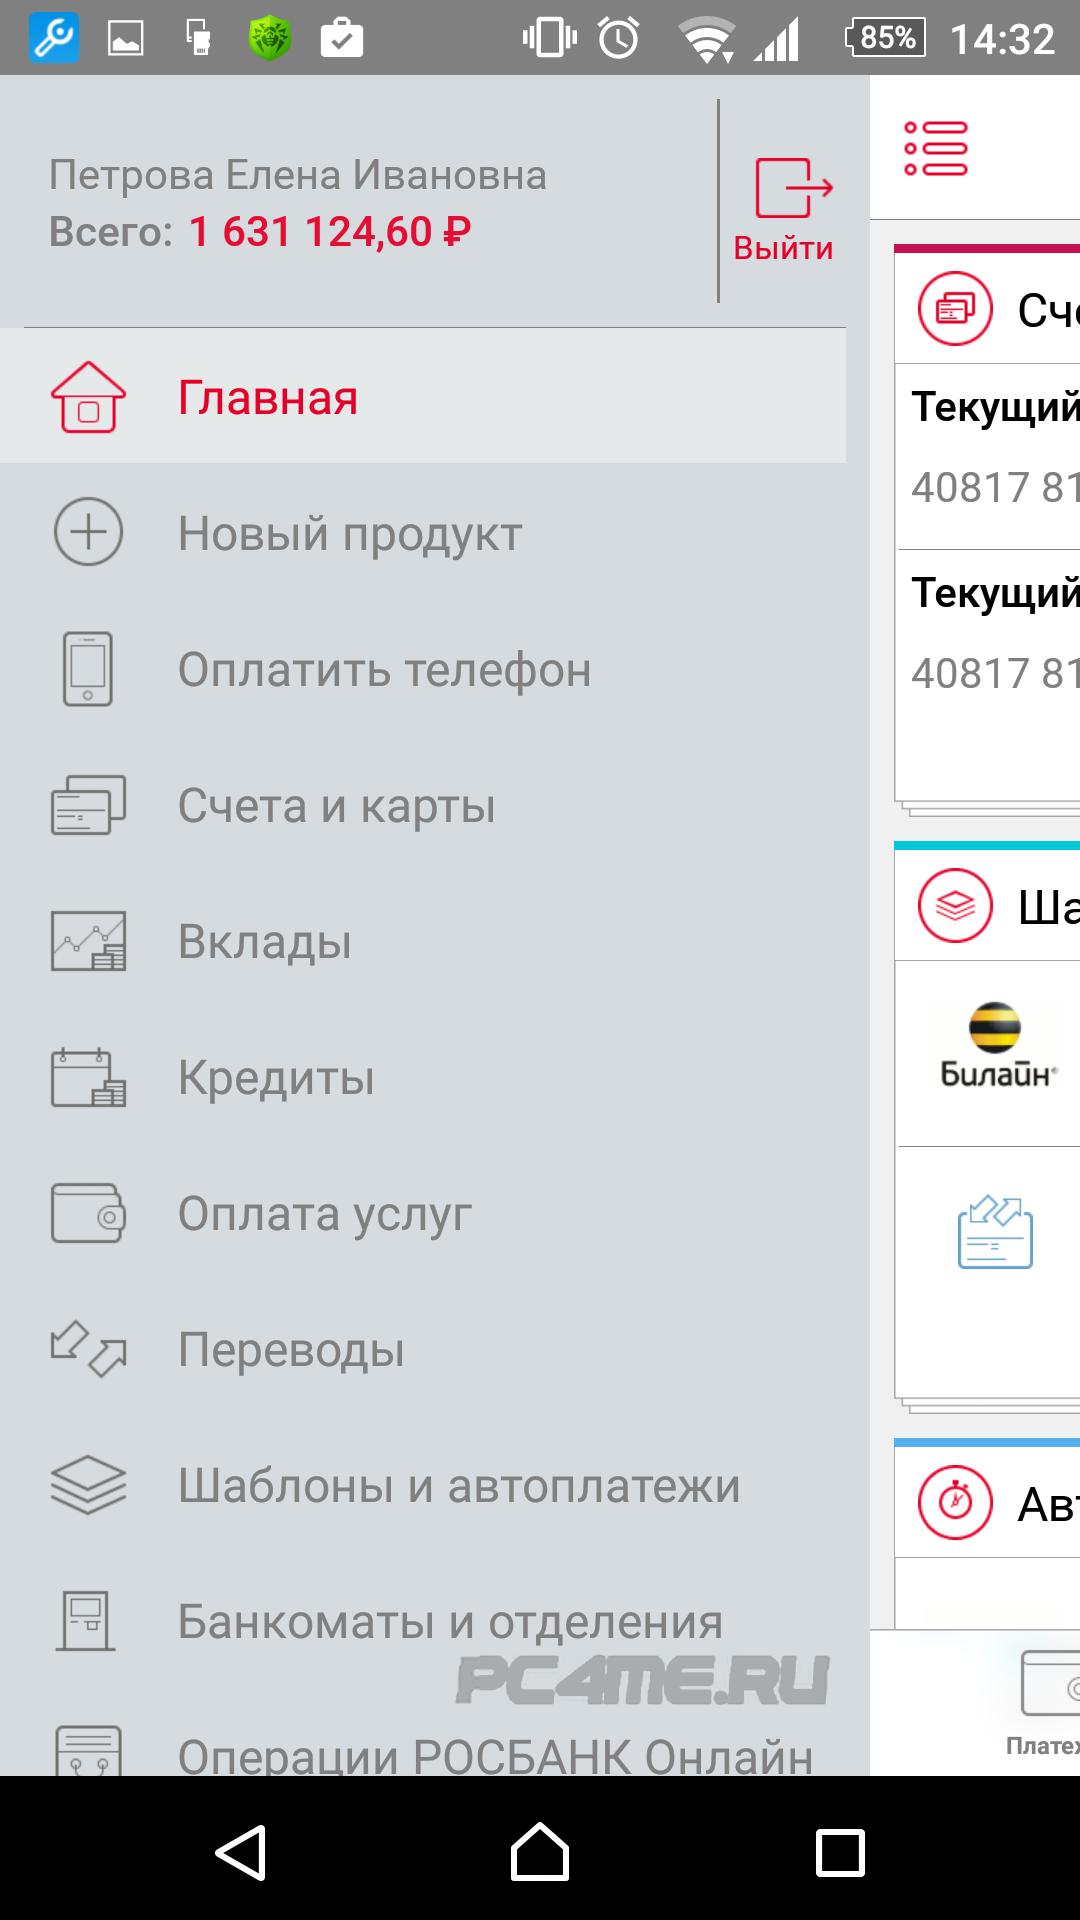 Screenshot_2016-09-13-14-32-19